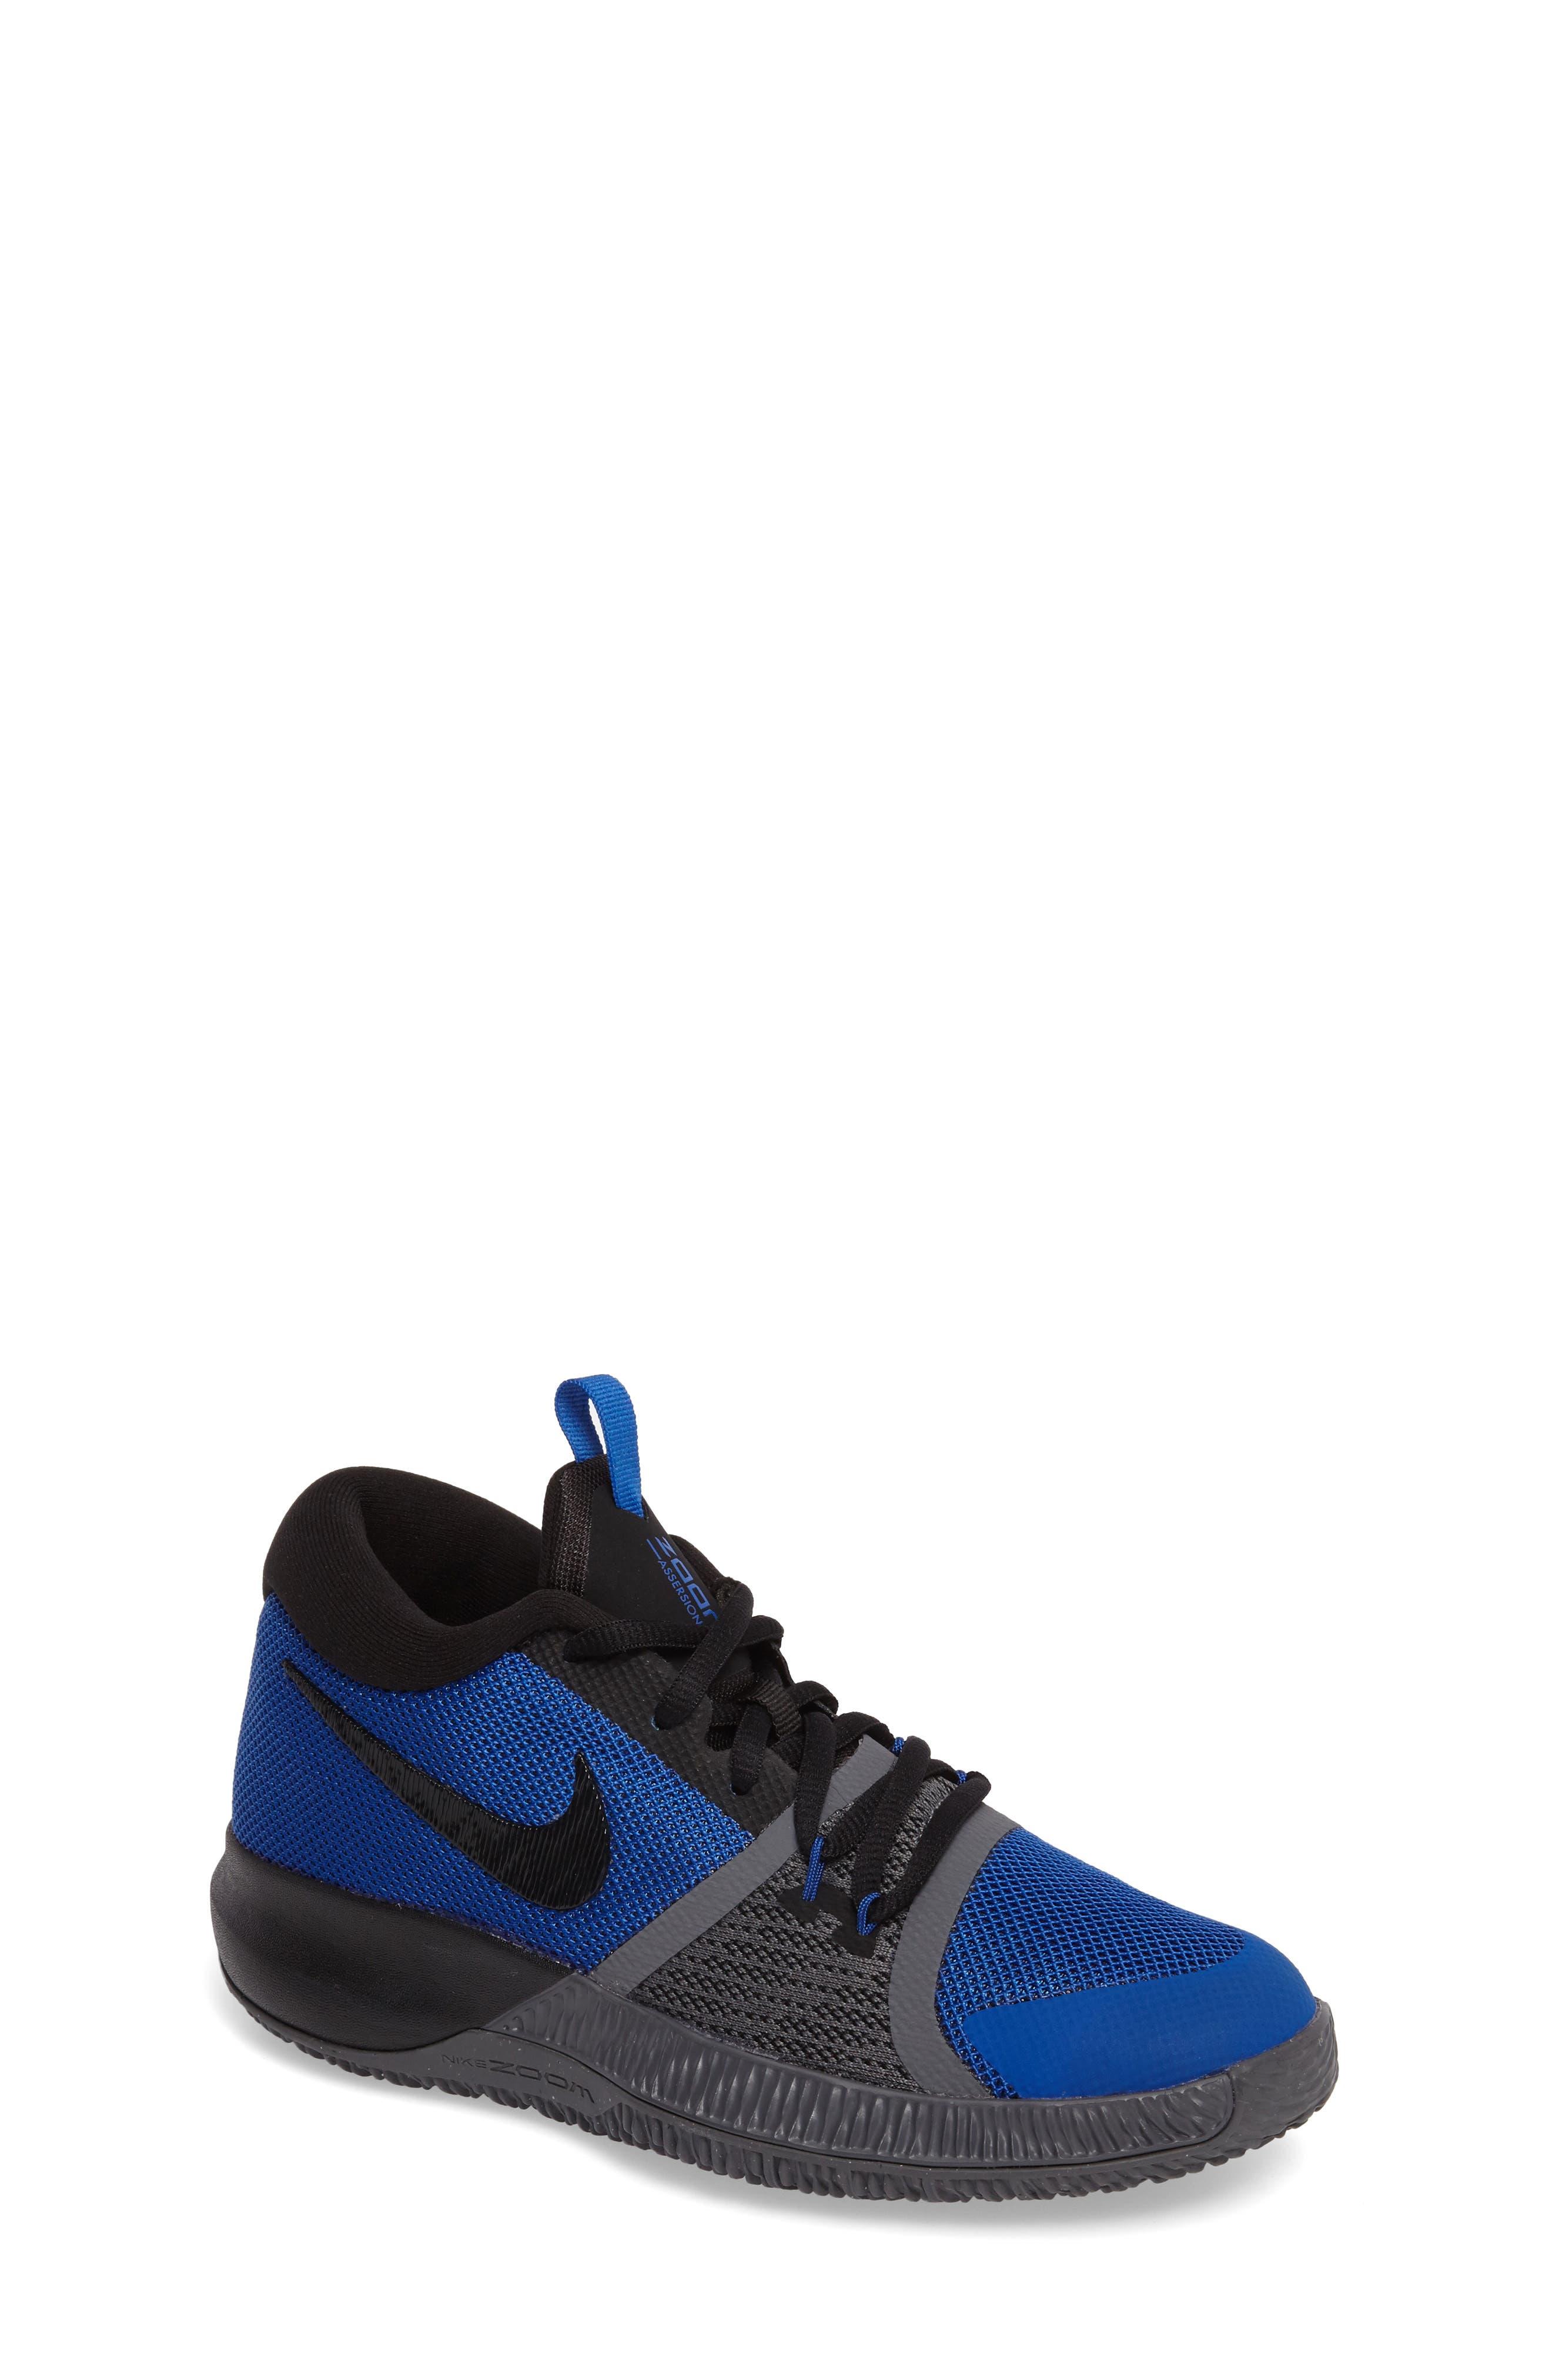 NIKE Zoom Assersion Basketball Shoe